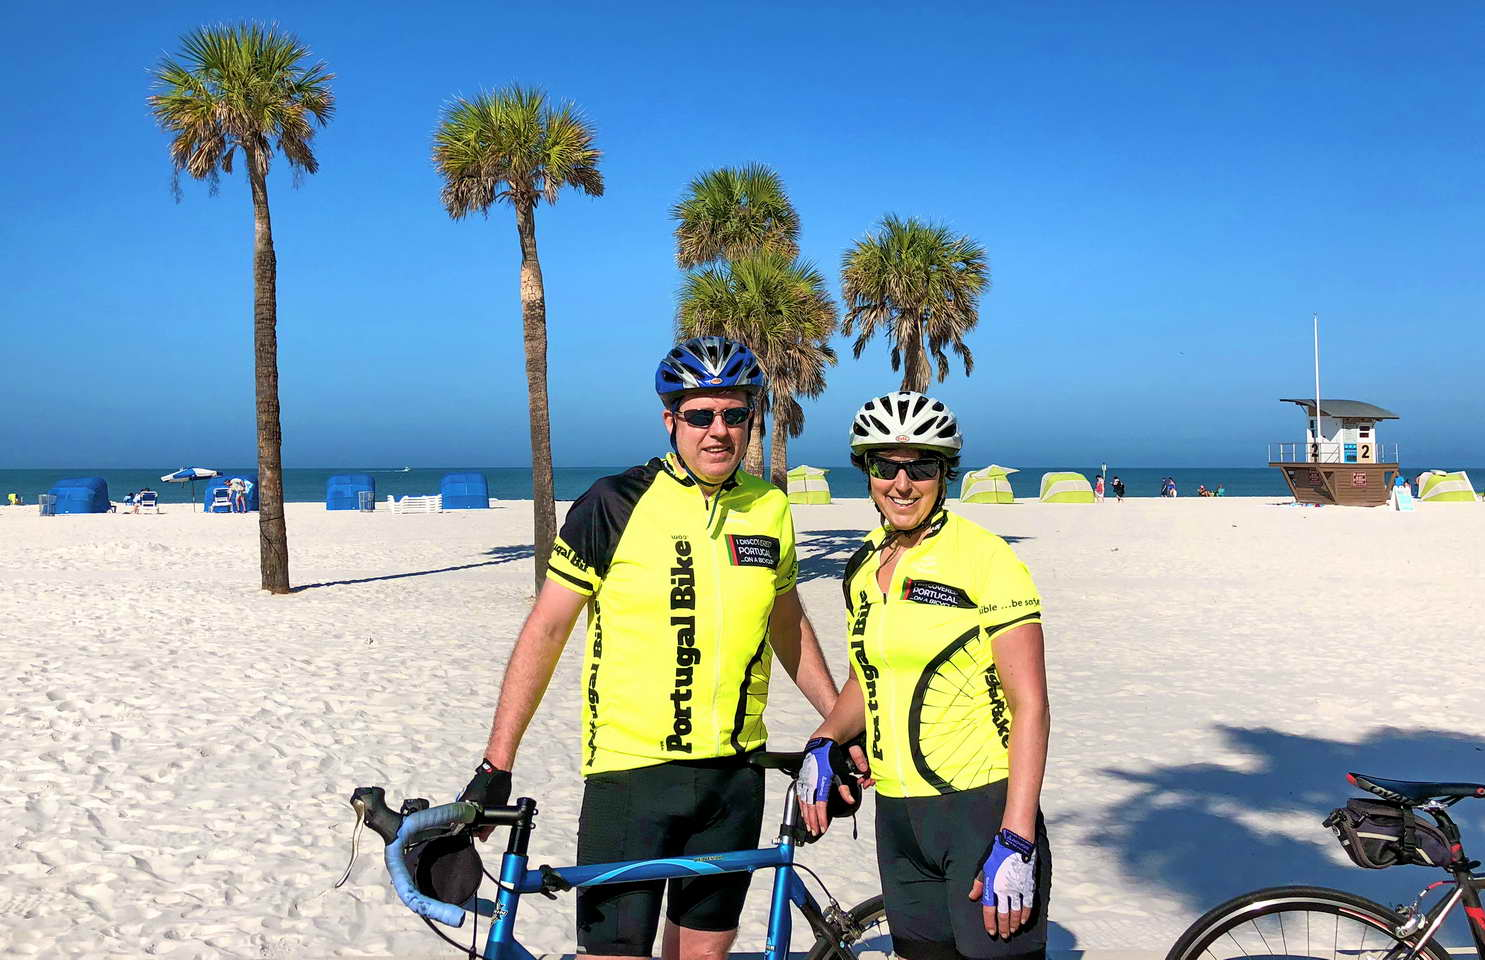 Portugal Bike jerseys Florida